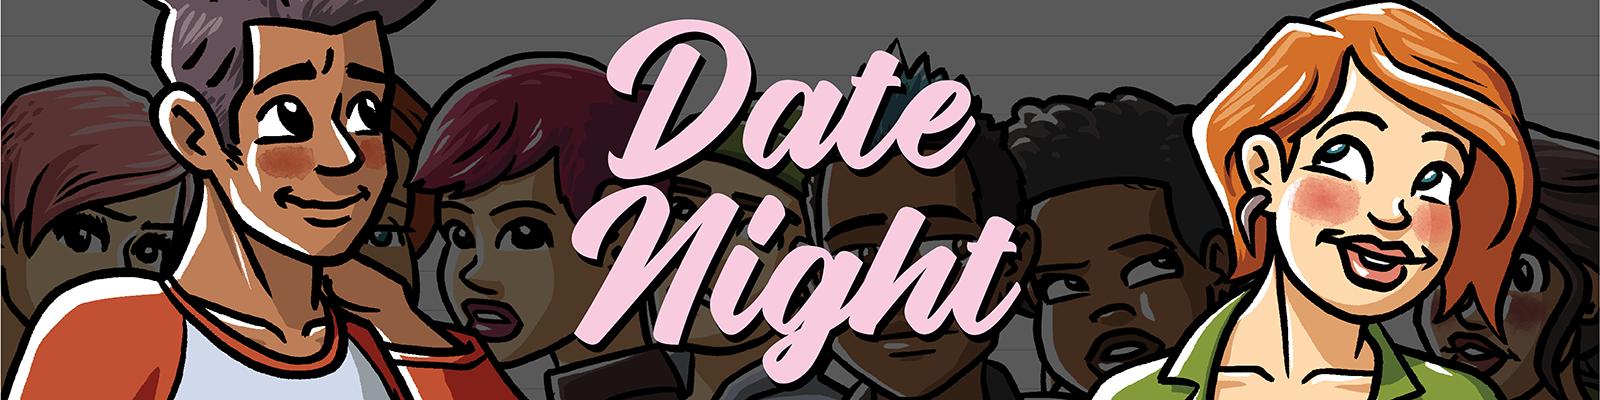 Date Night (Demo, NSFW)